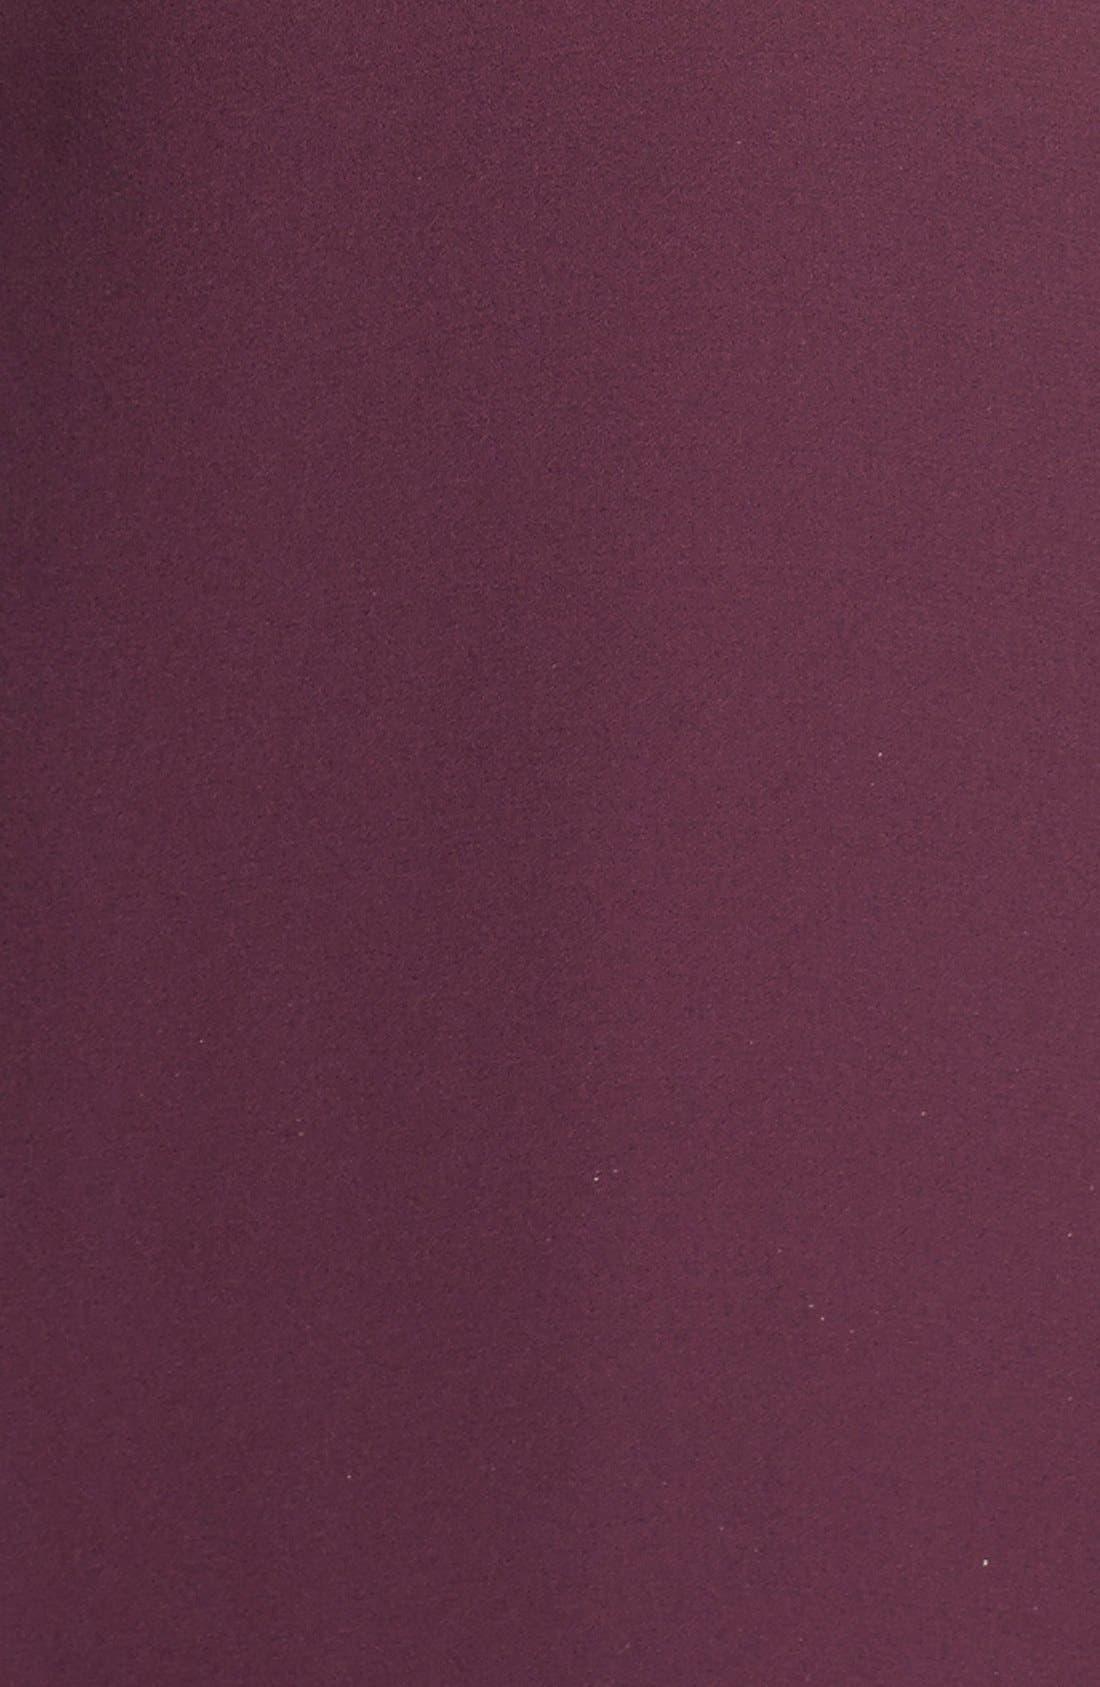 Alternate Image 3  - Evans Embellished Collar Blouse (Plus Size)